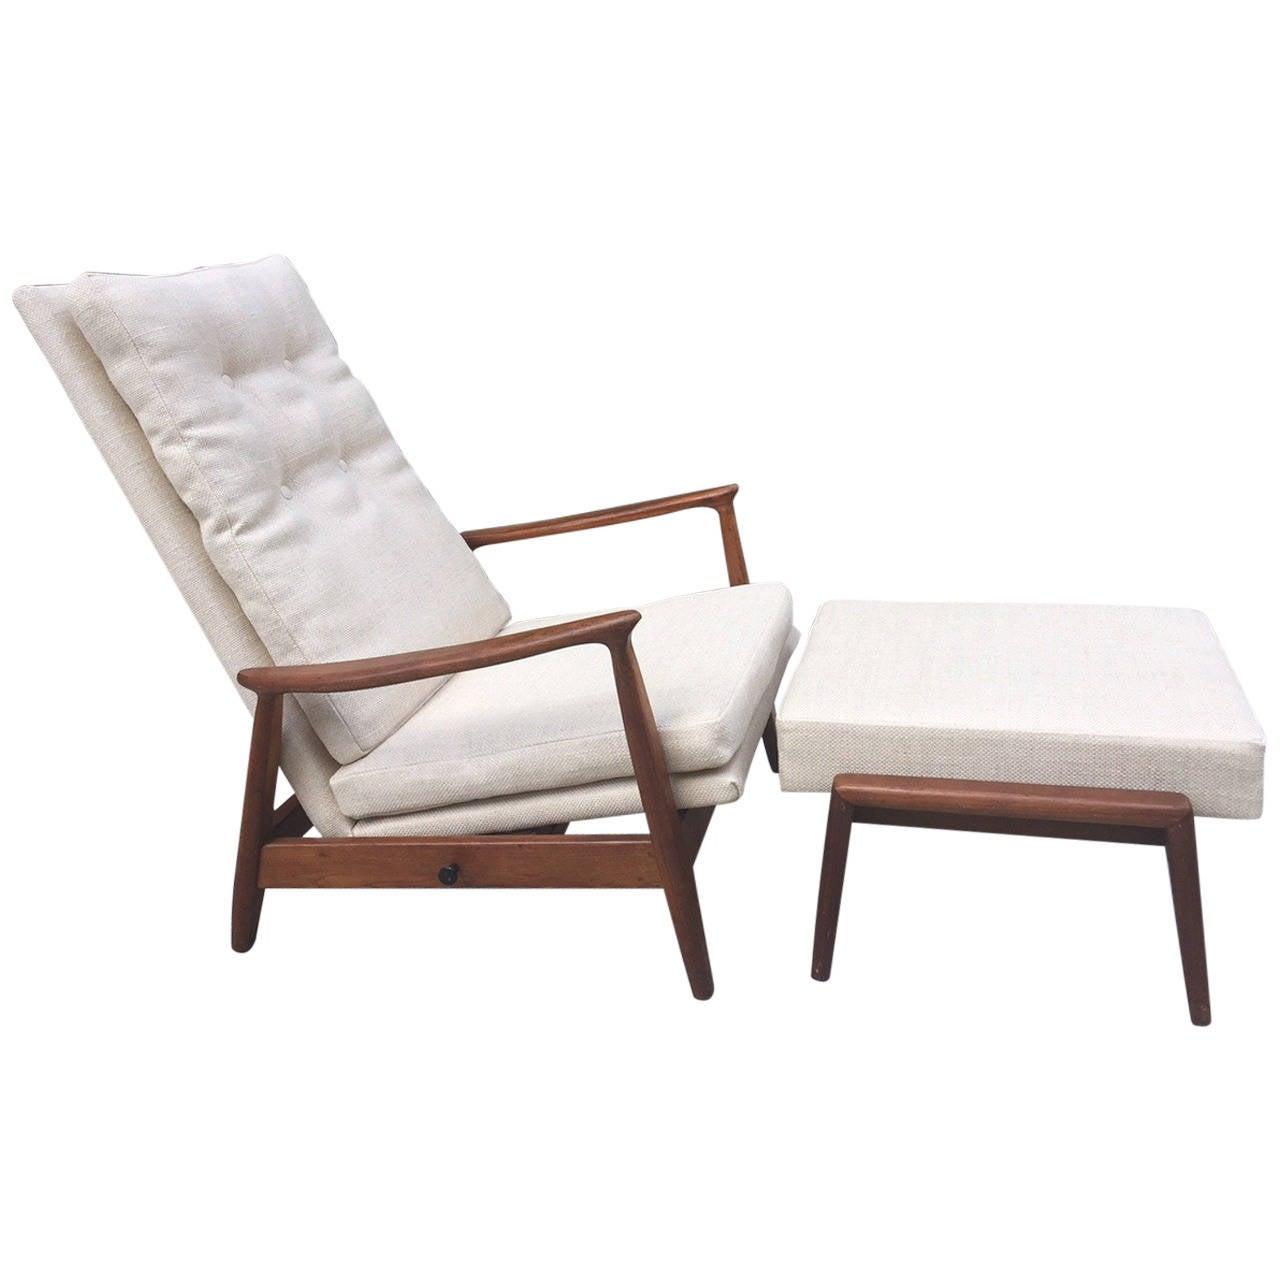 Milo Baughman Reclining Chair and Ottoman in Linen